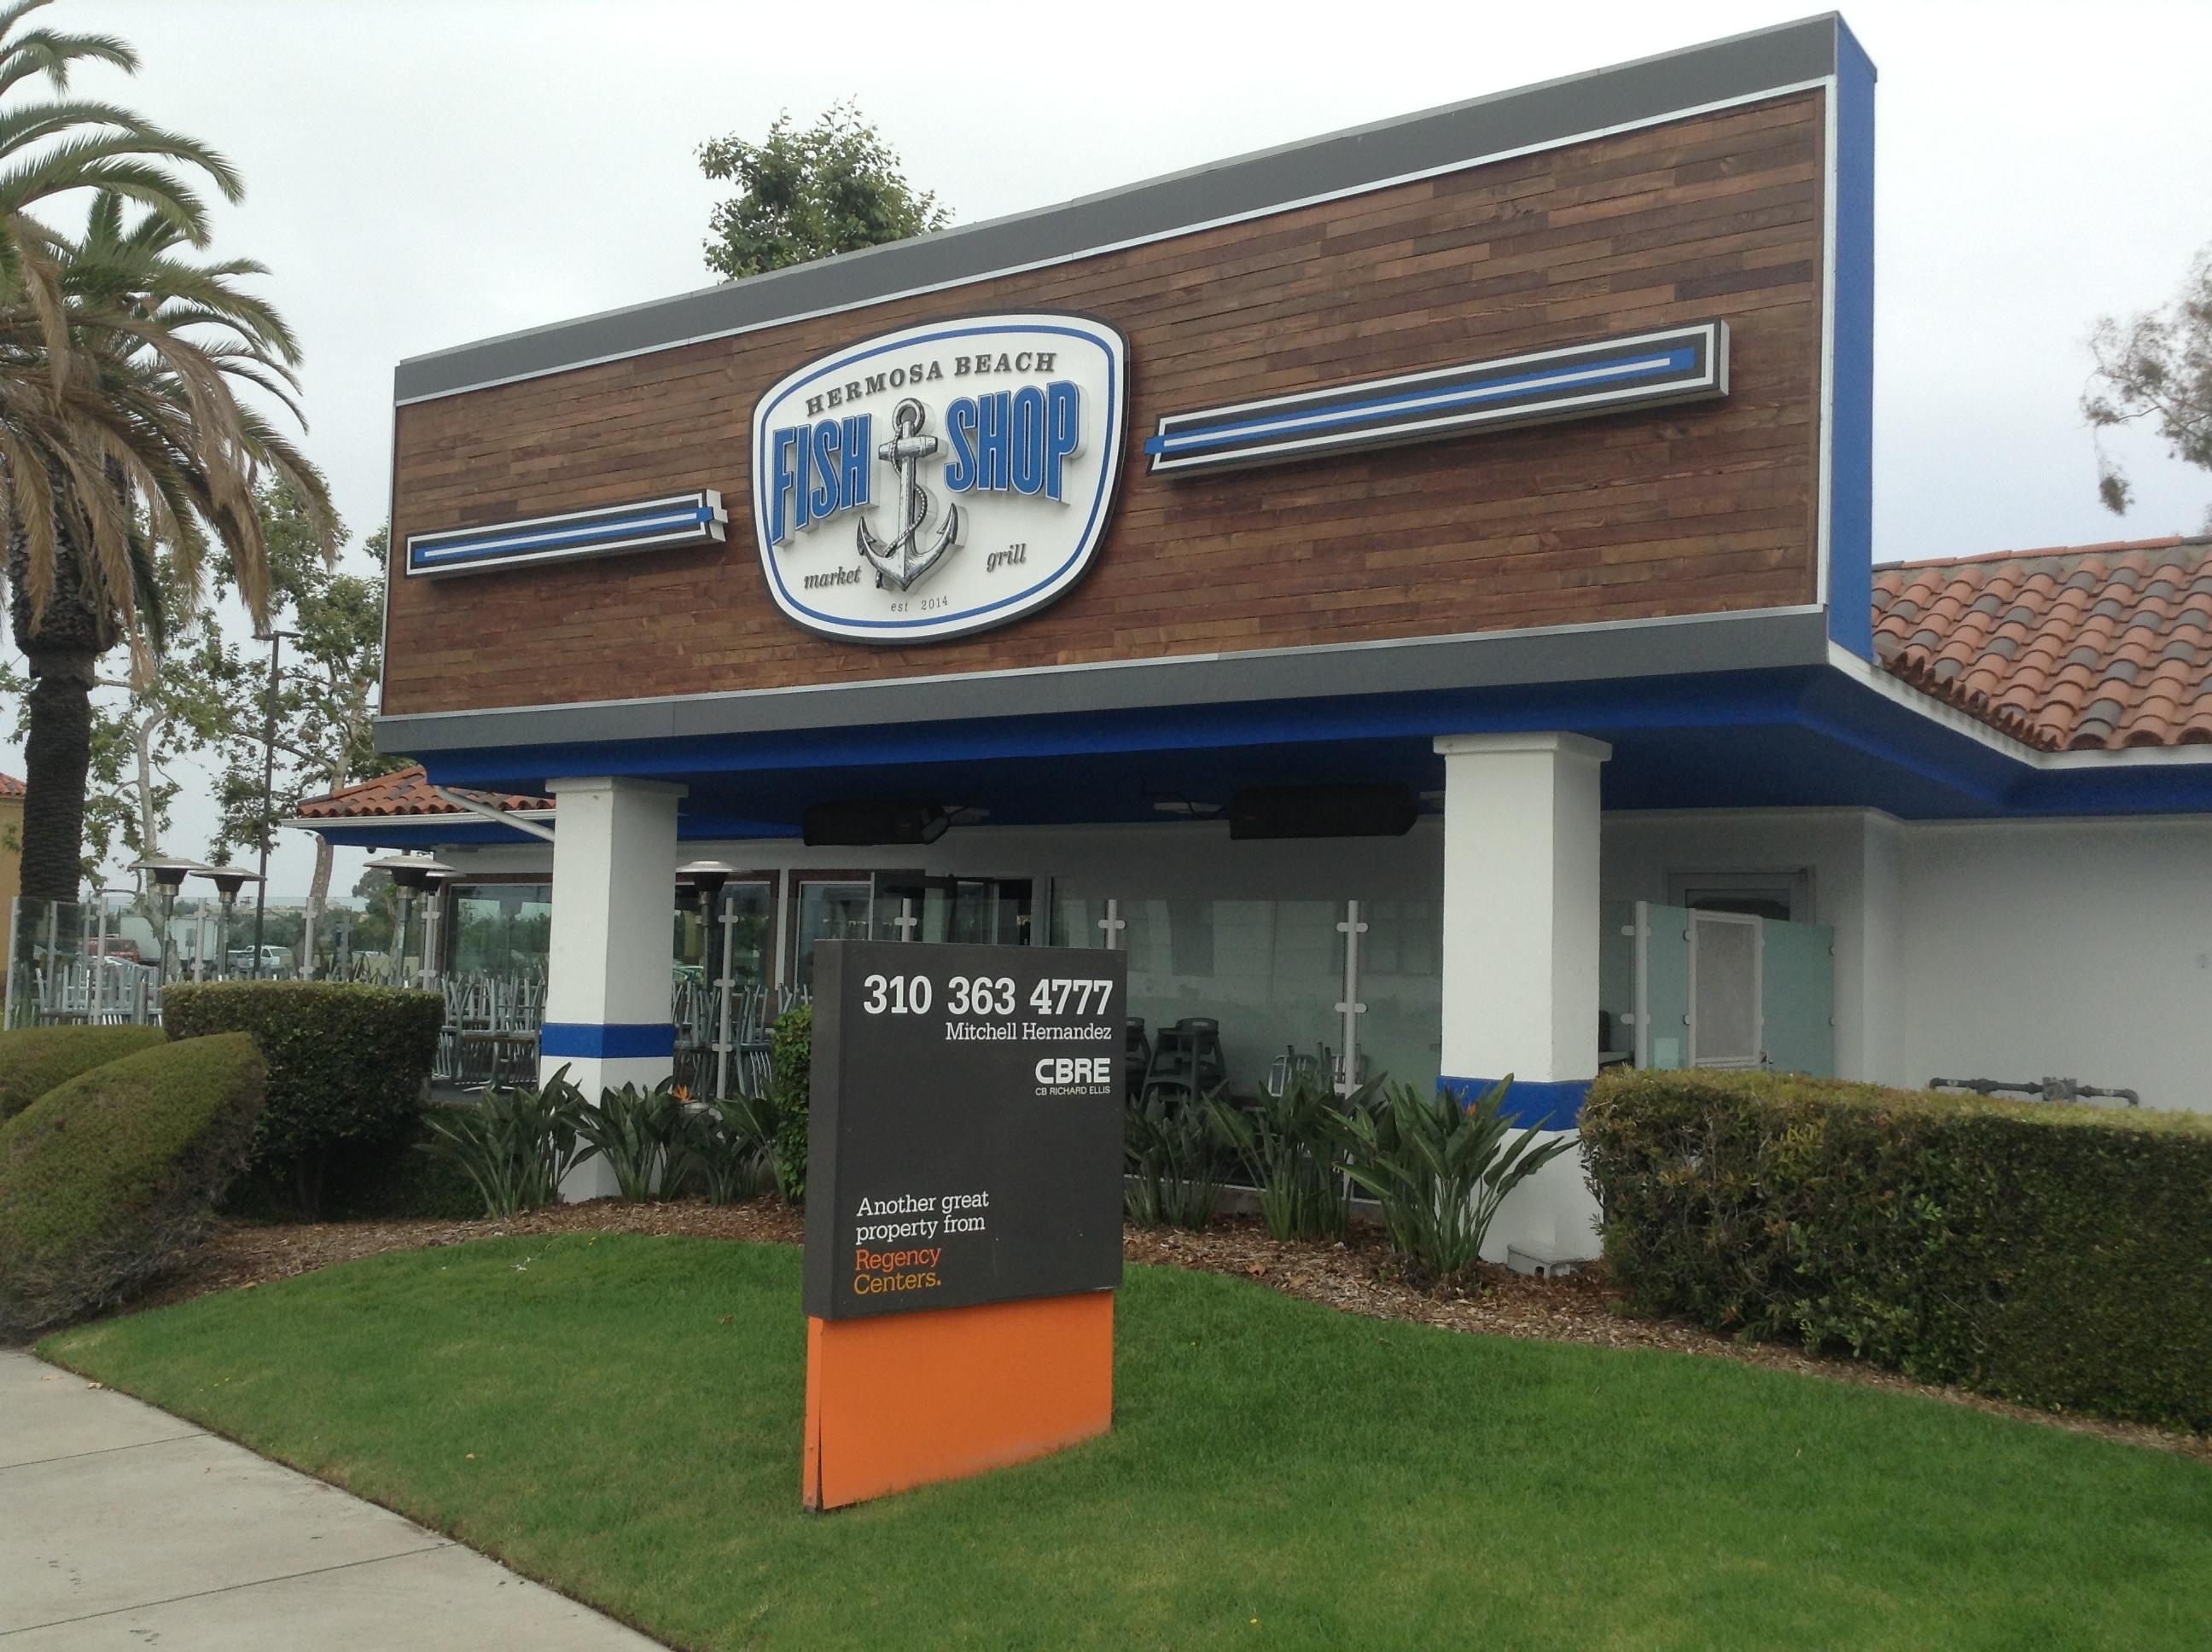 Hermosa Beach Fish Shop new to Plaza Hermosa. (Photo: Business Wire)